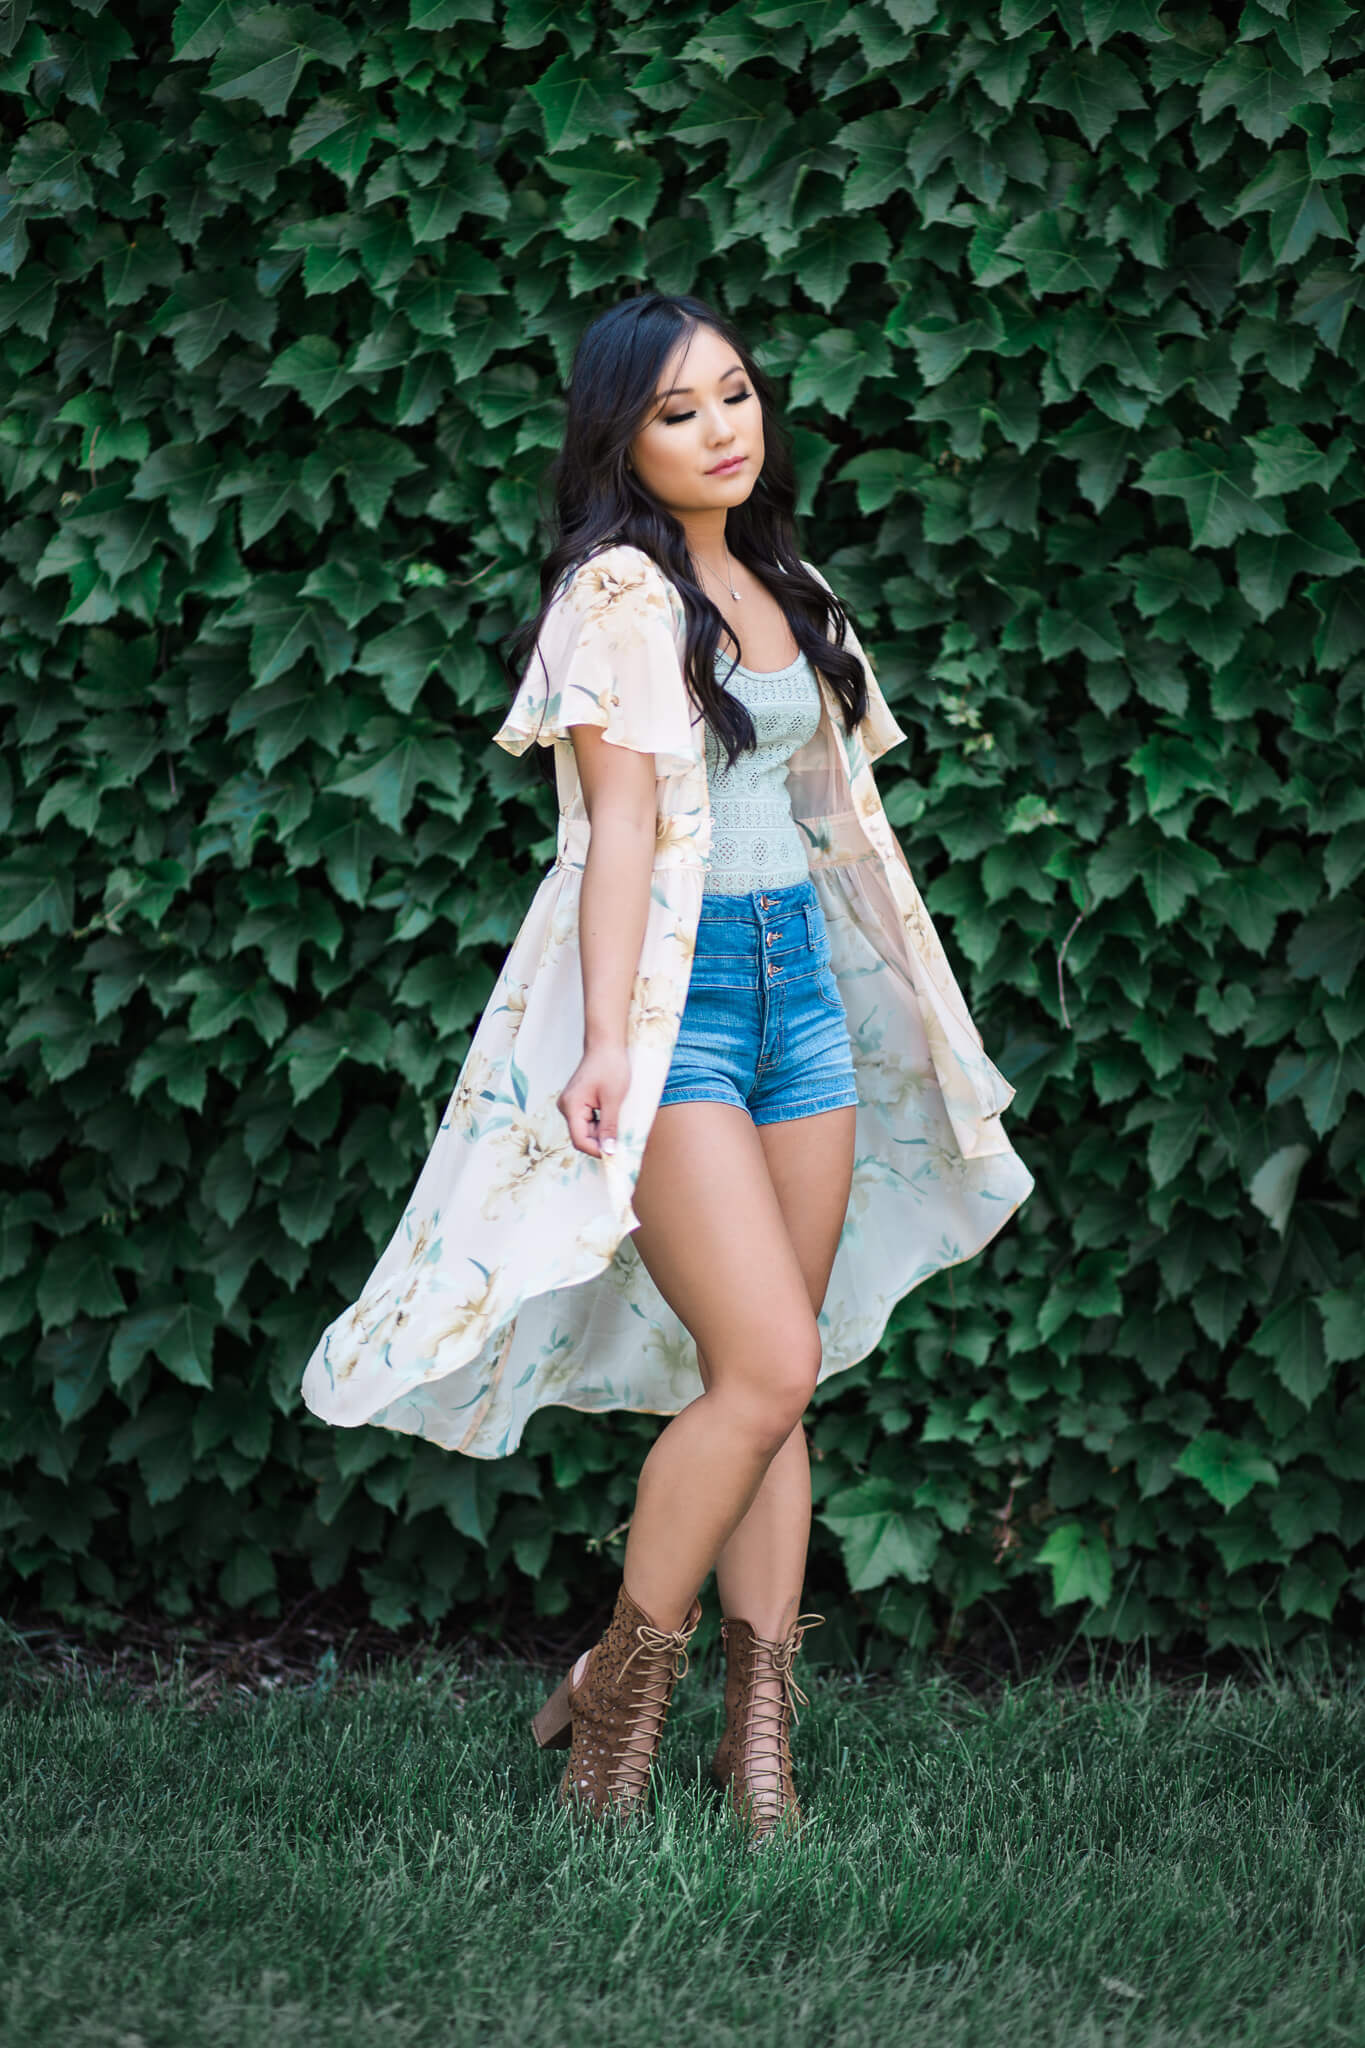 sioux-city-senior-photography-kimono-ivy-wall-suing-studios.jpg